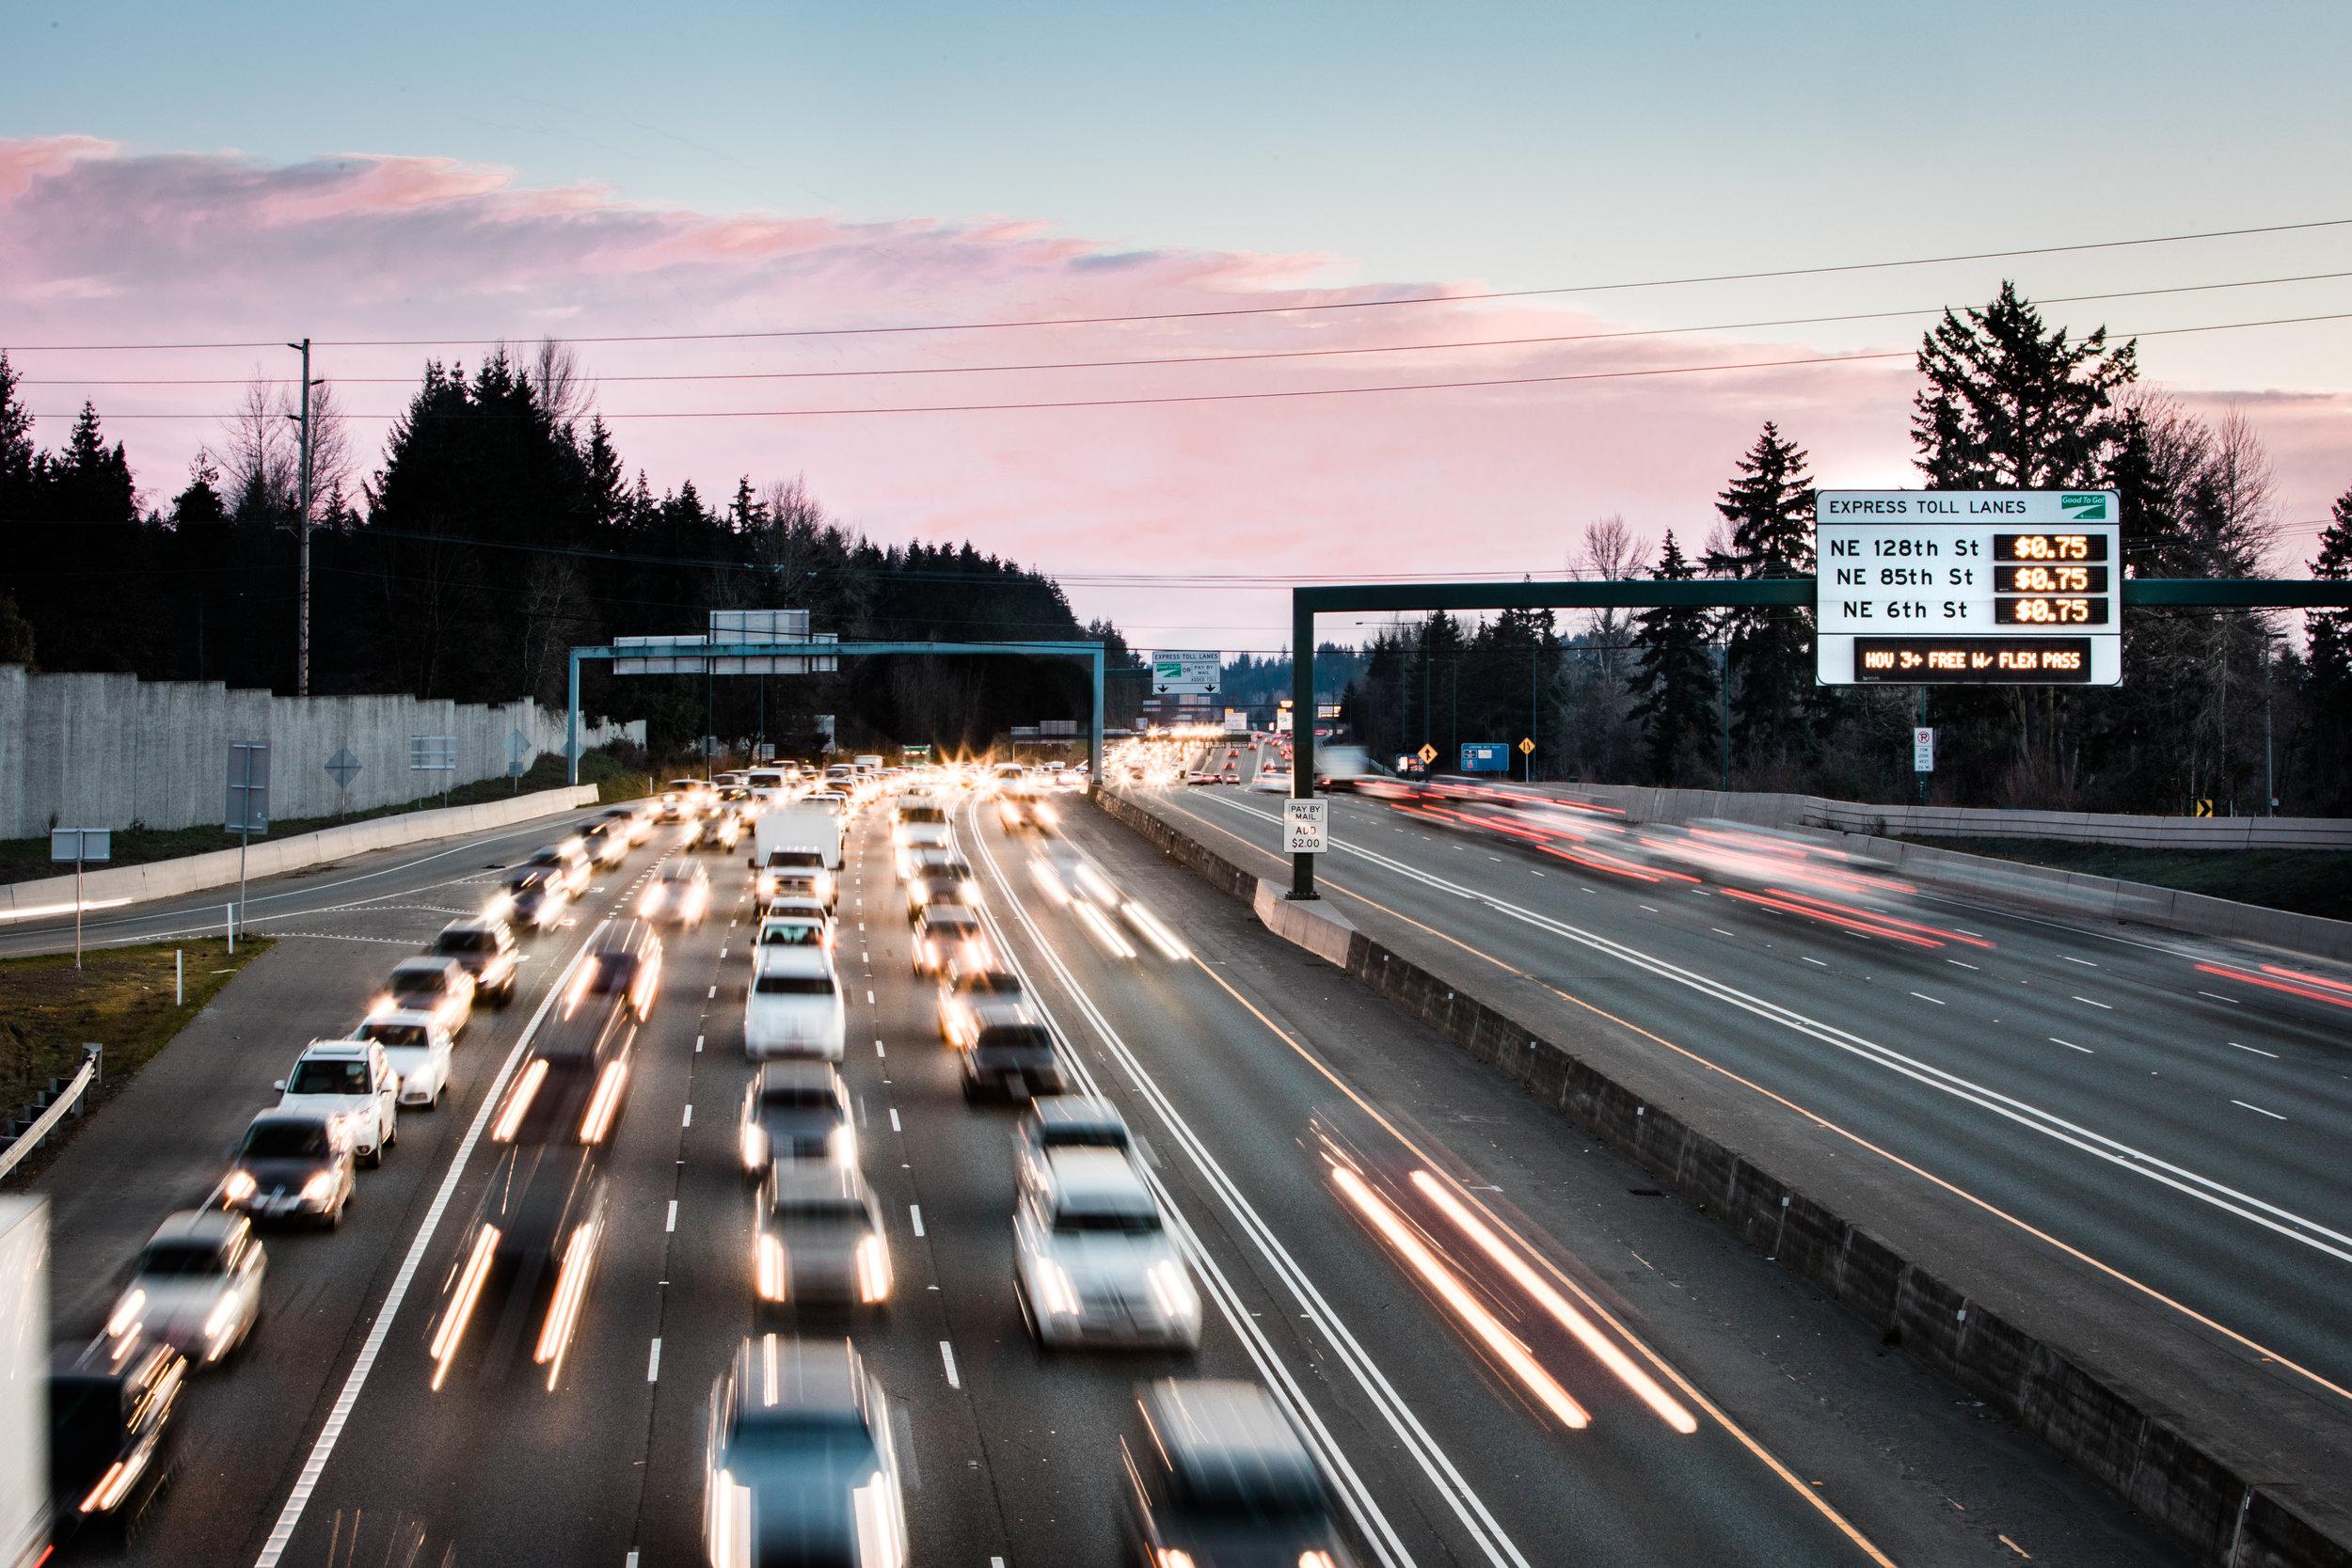 DKS_I-405 Hot Lanes 2019_Photo 04_by KLiK Concepts.jpg